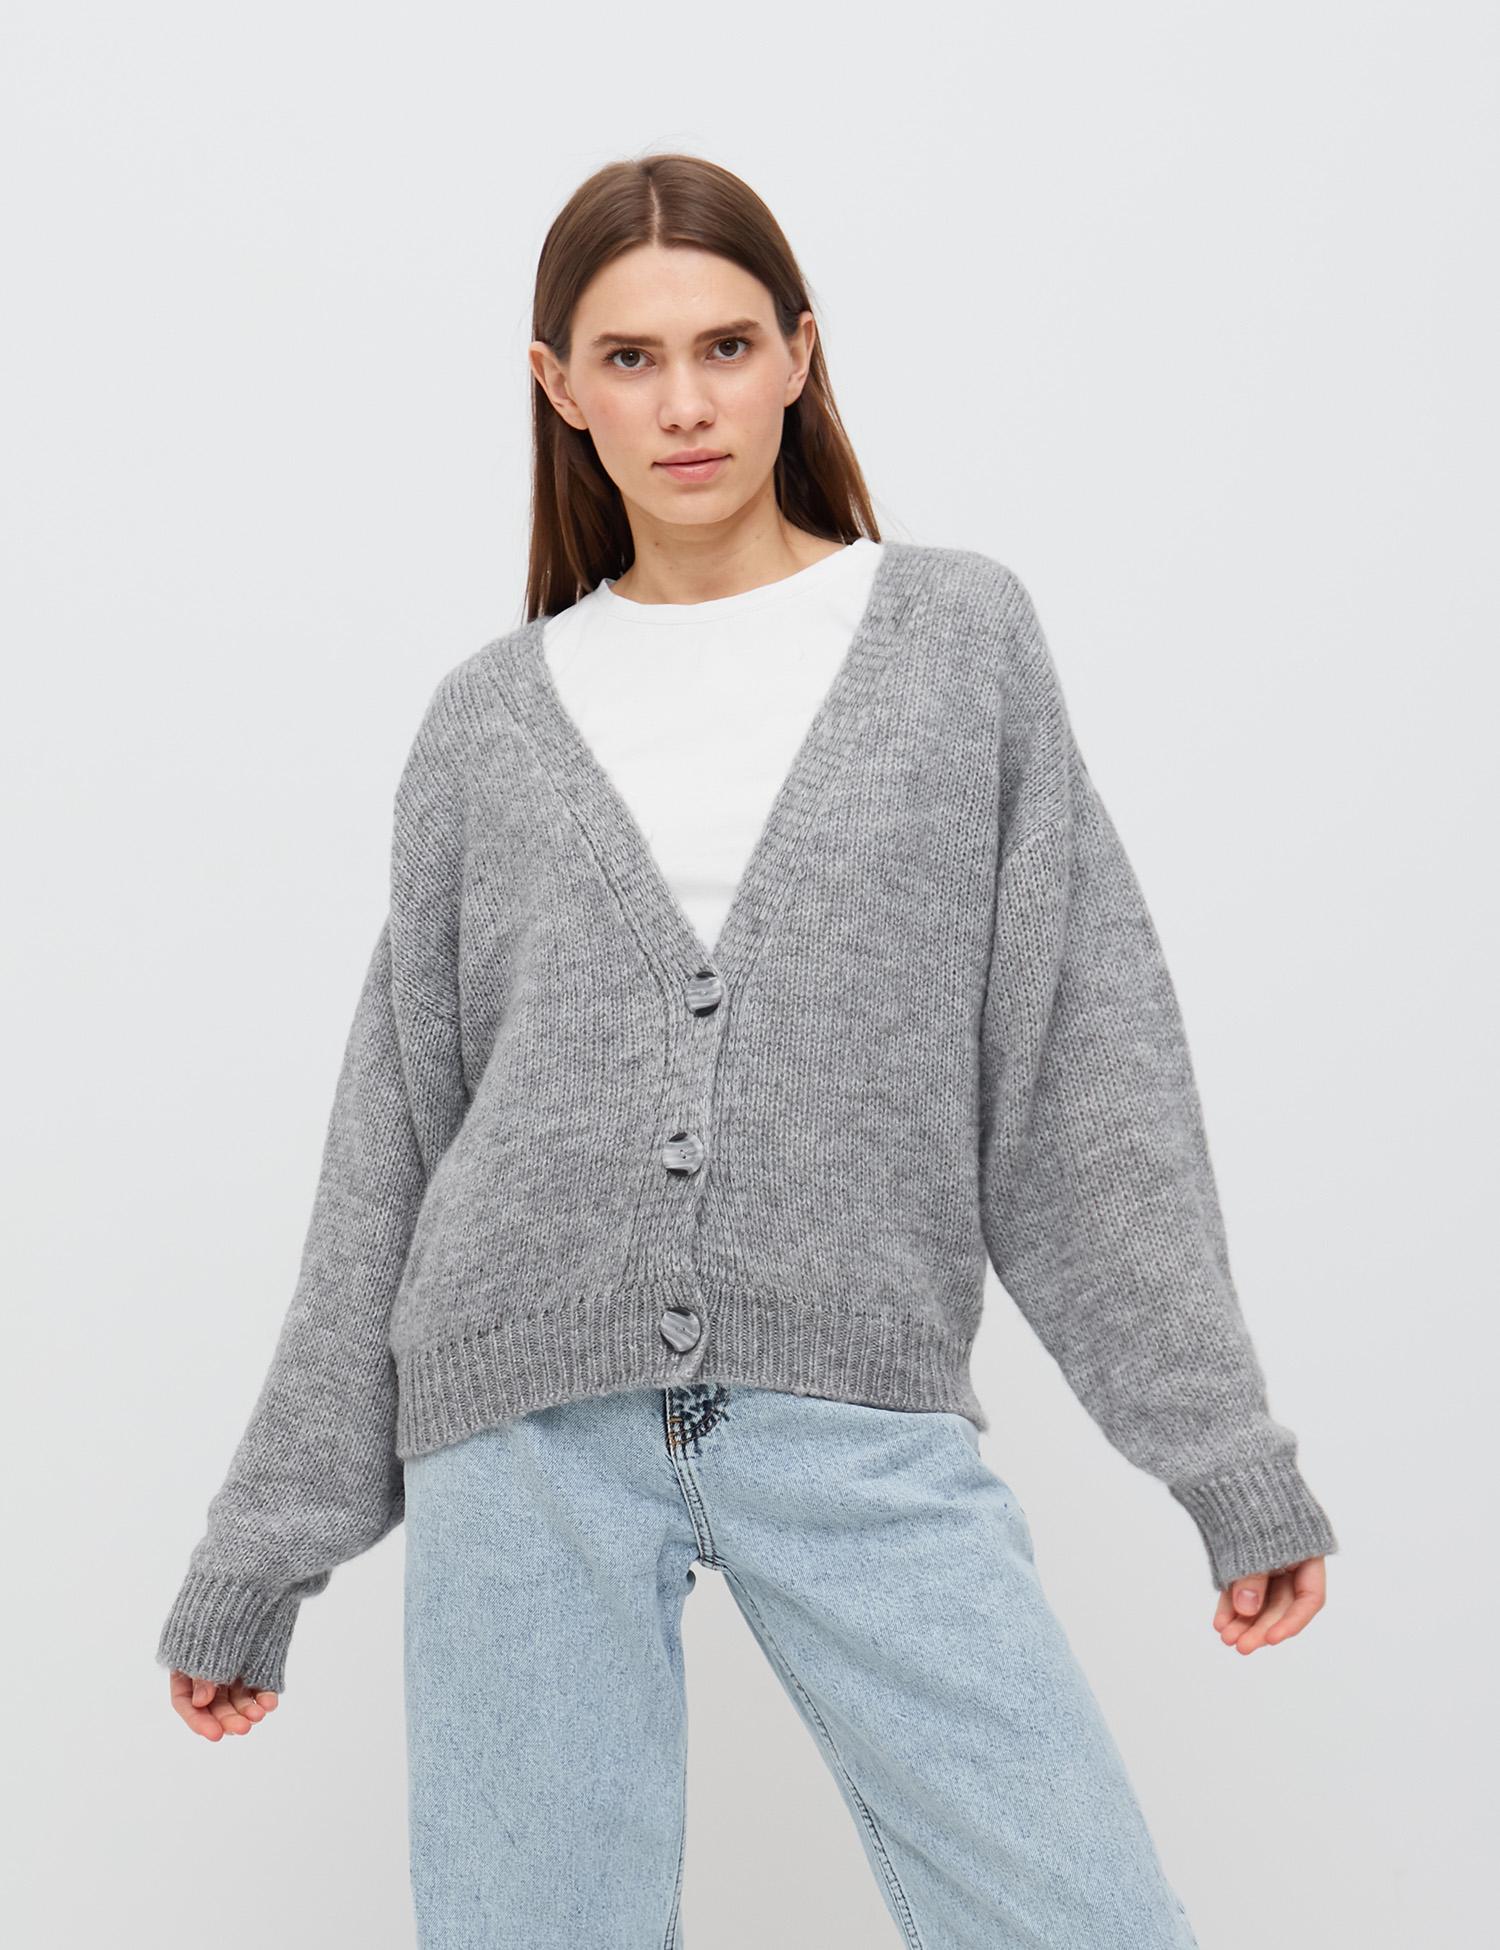 модный кардиган осень зима 2021 украинский бренд серый